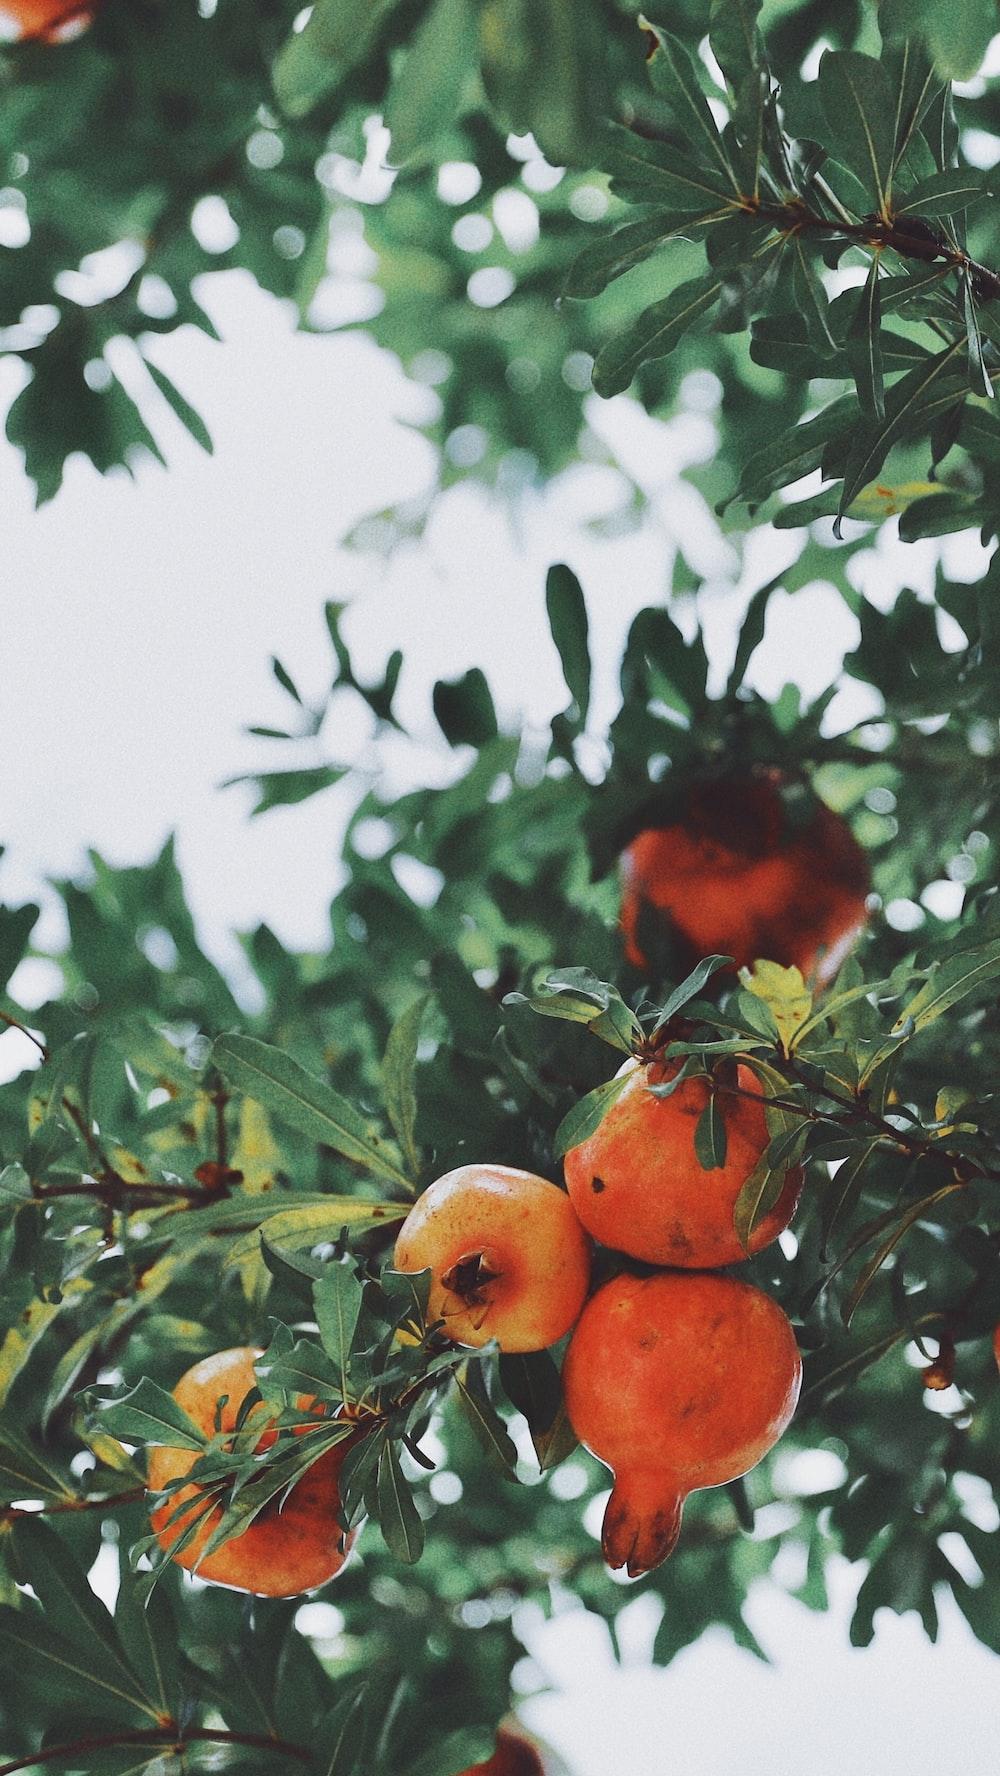 orange fruit on green tree,अनार की खेती